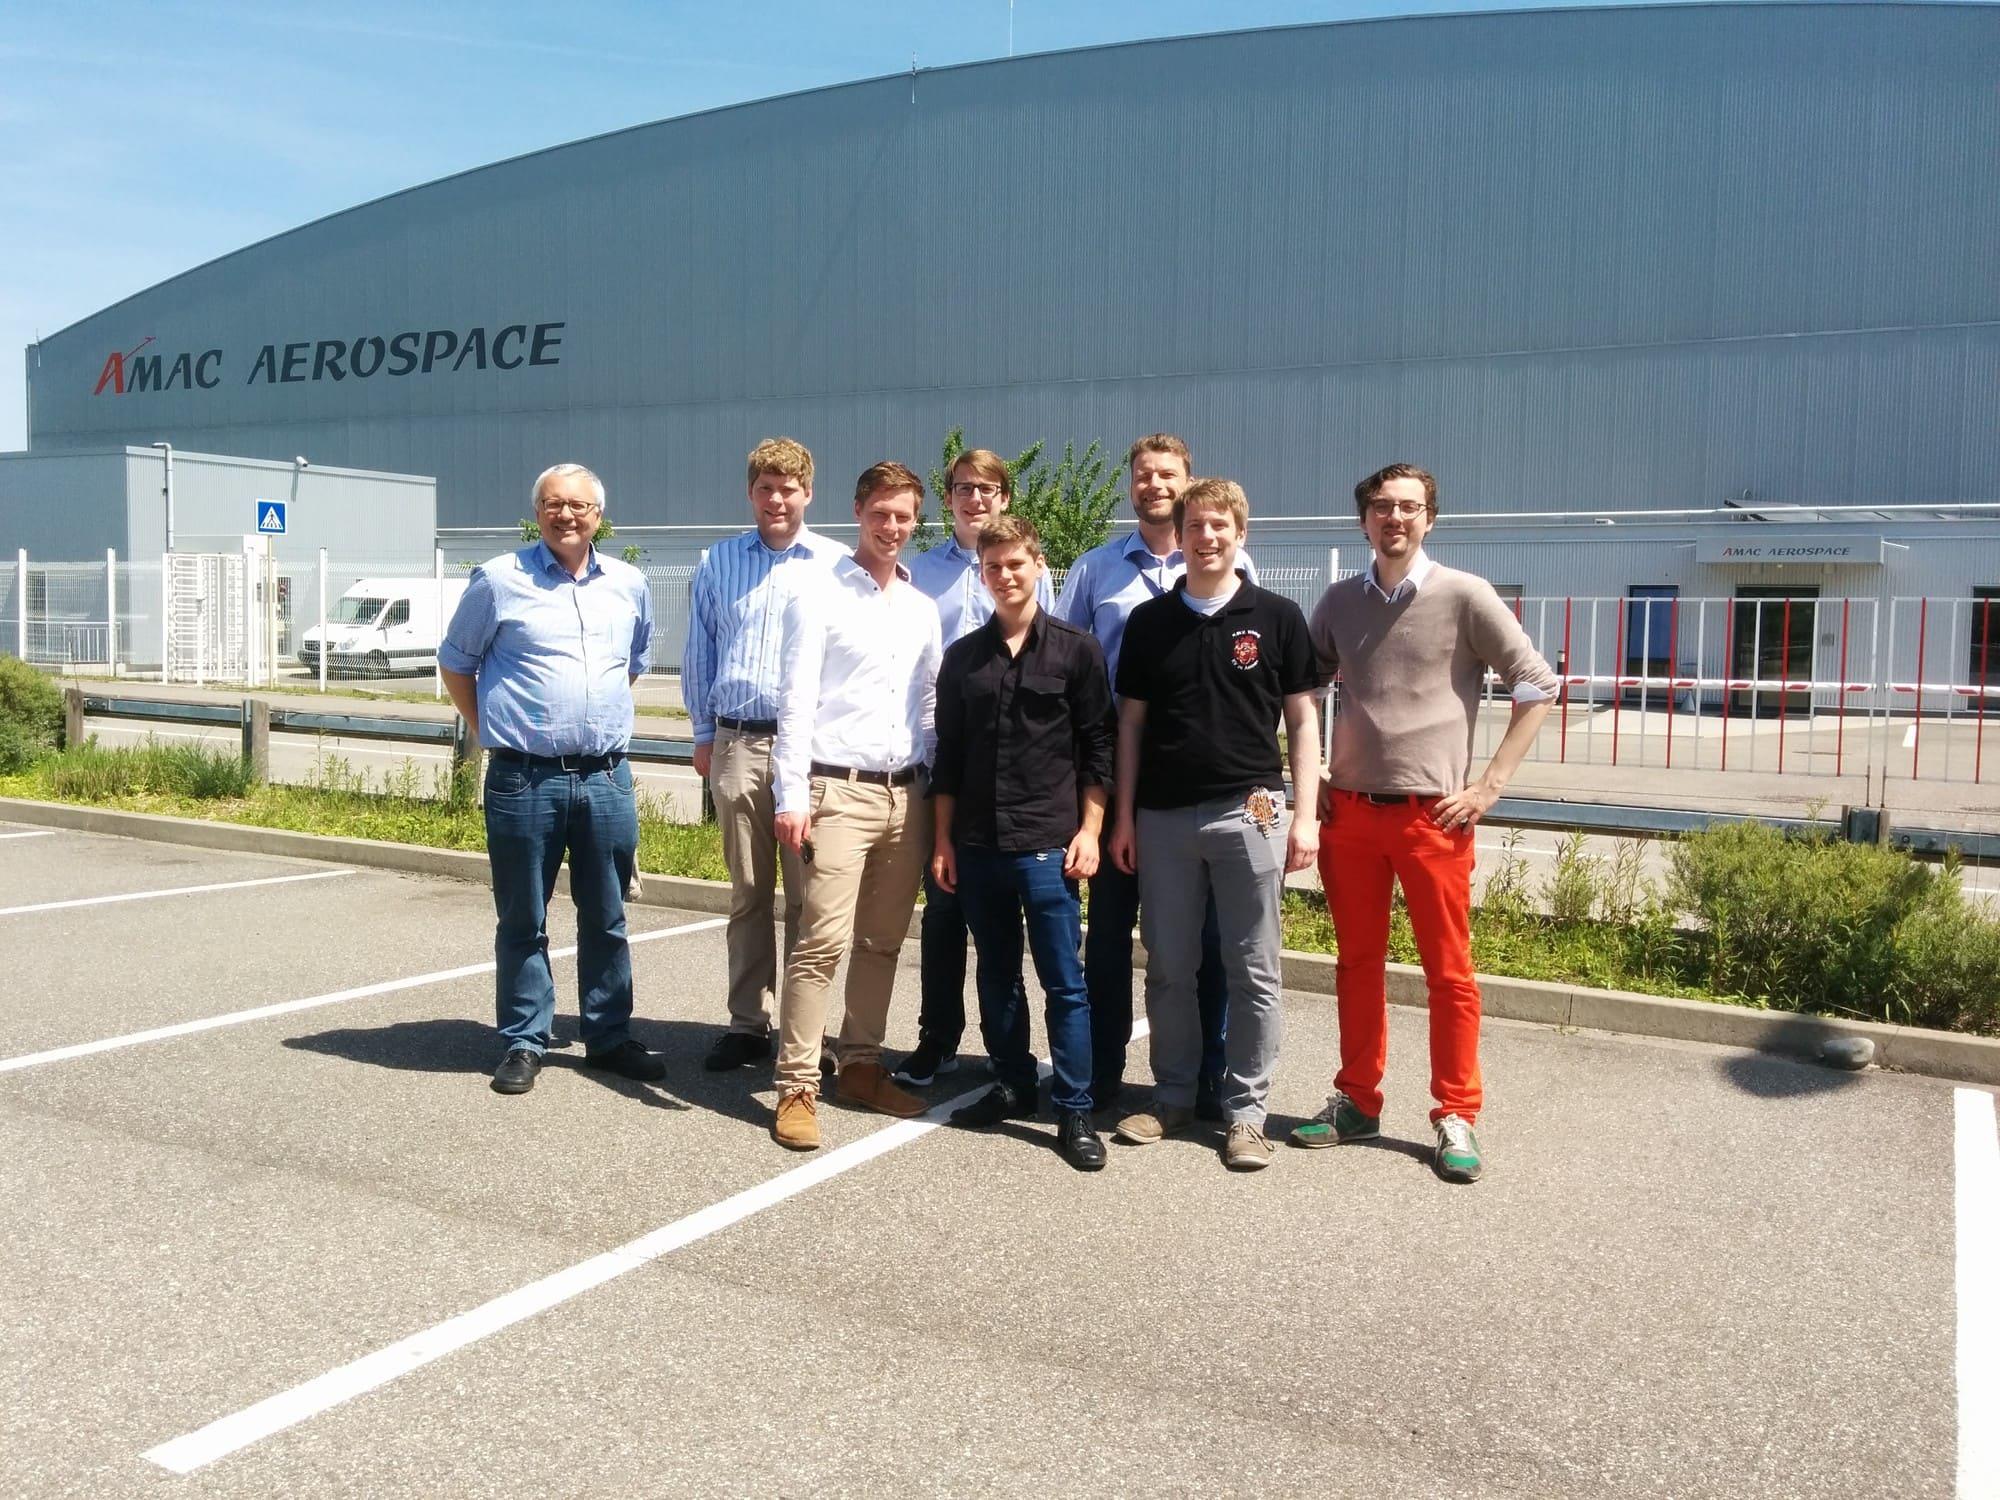 Gruppenbild AMAC Aerospace